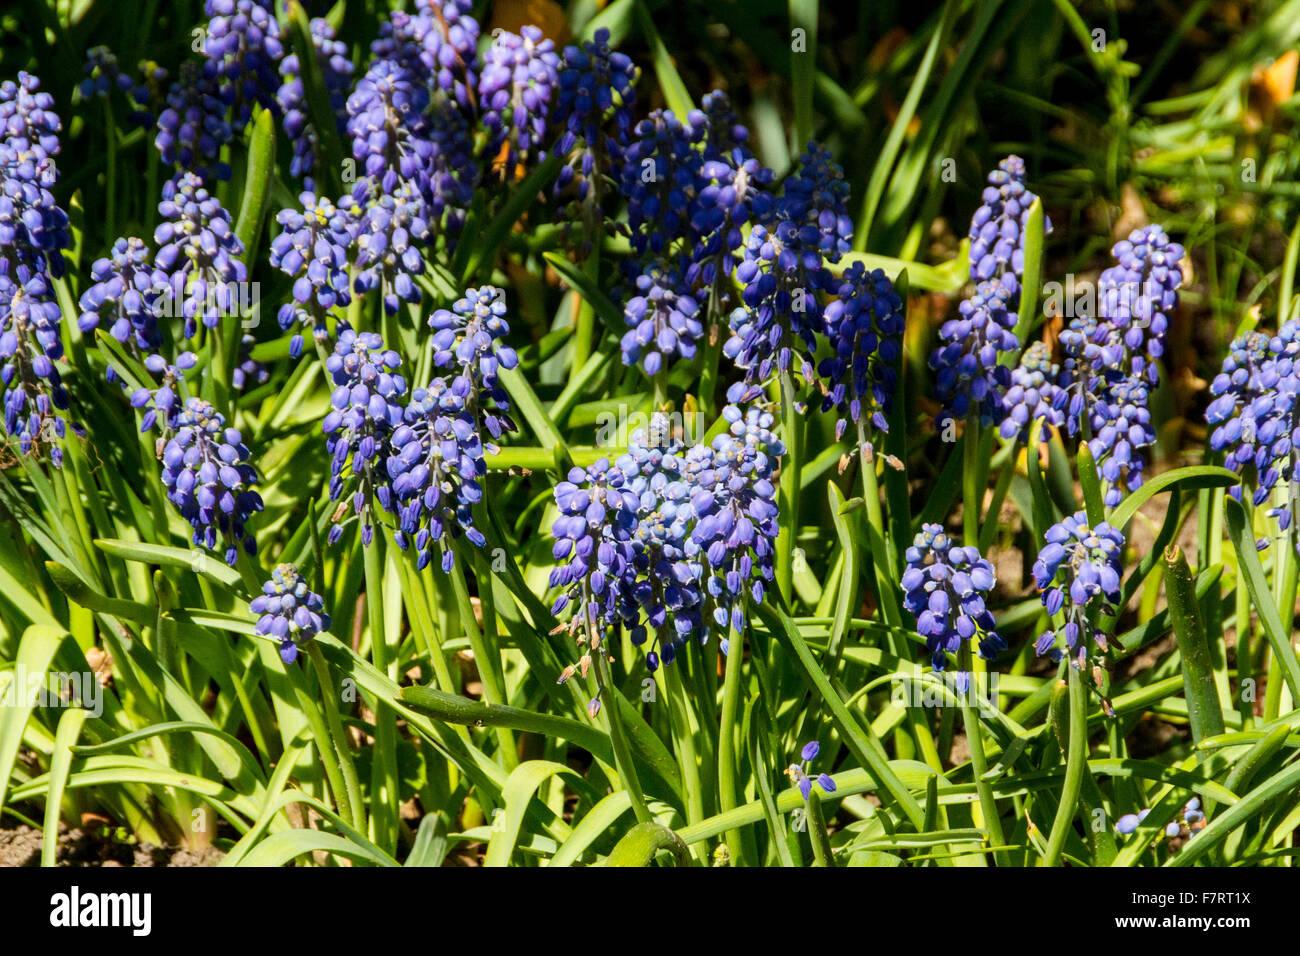 First blue springs flowers muscari stock photo royalty free image first blue springs flowers muscari mightylinksfo